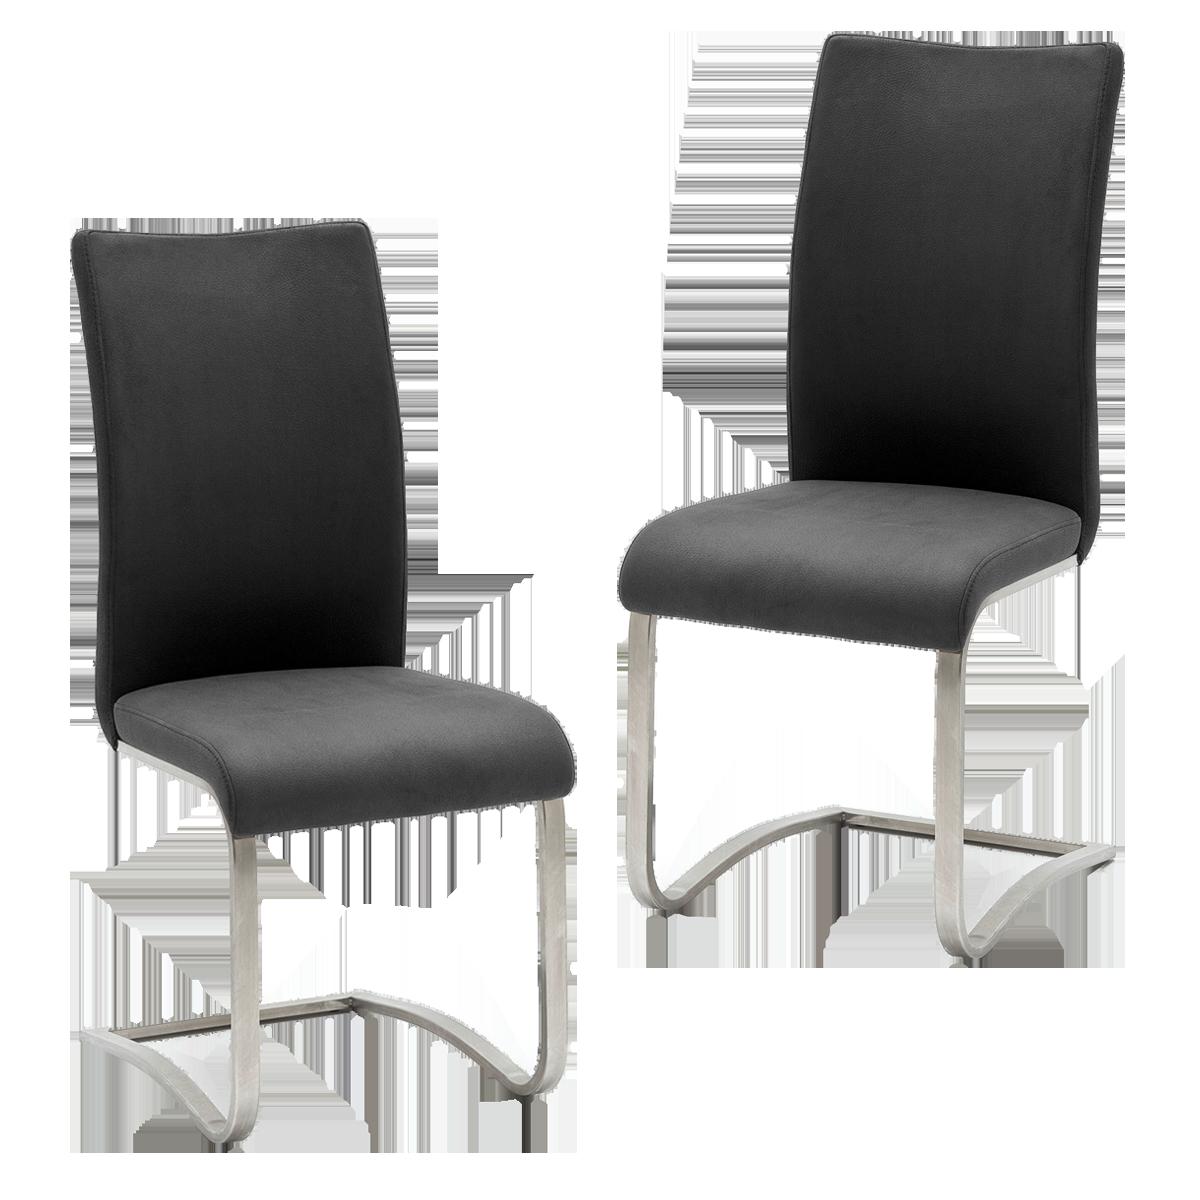 Mca Furniture Arco Ii Stuhl Mit Schwinggestell Bezug Echtleder 2er Set